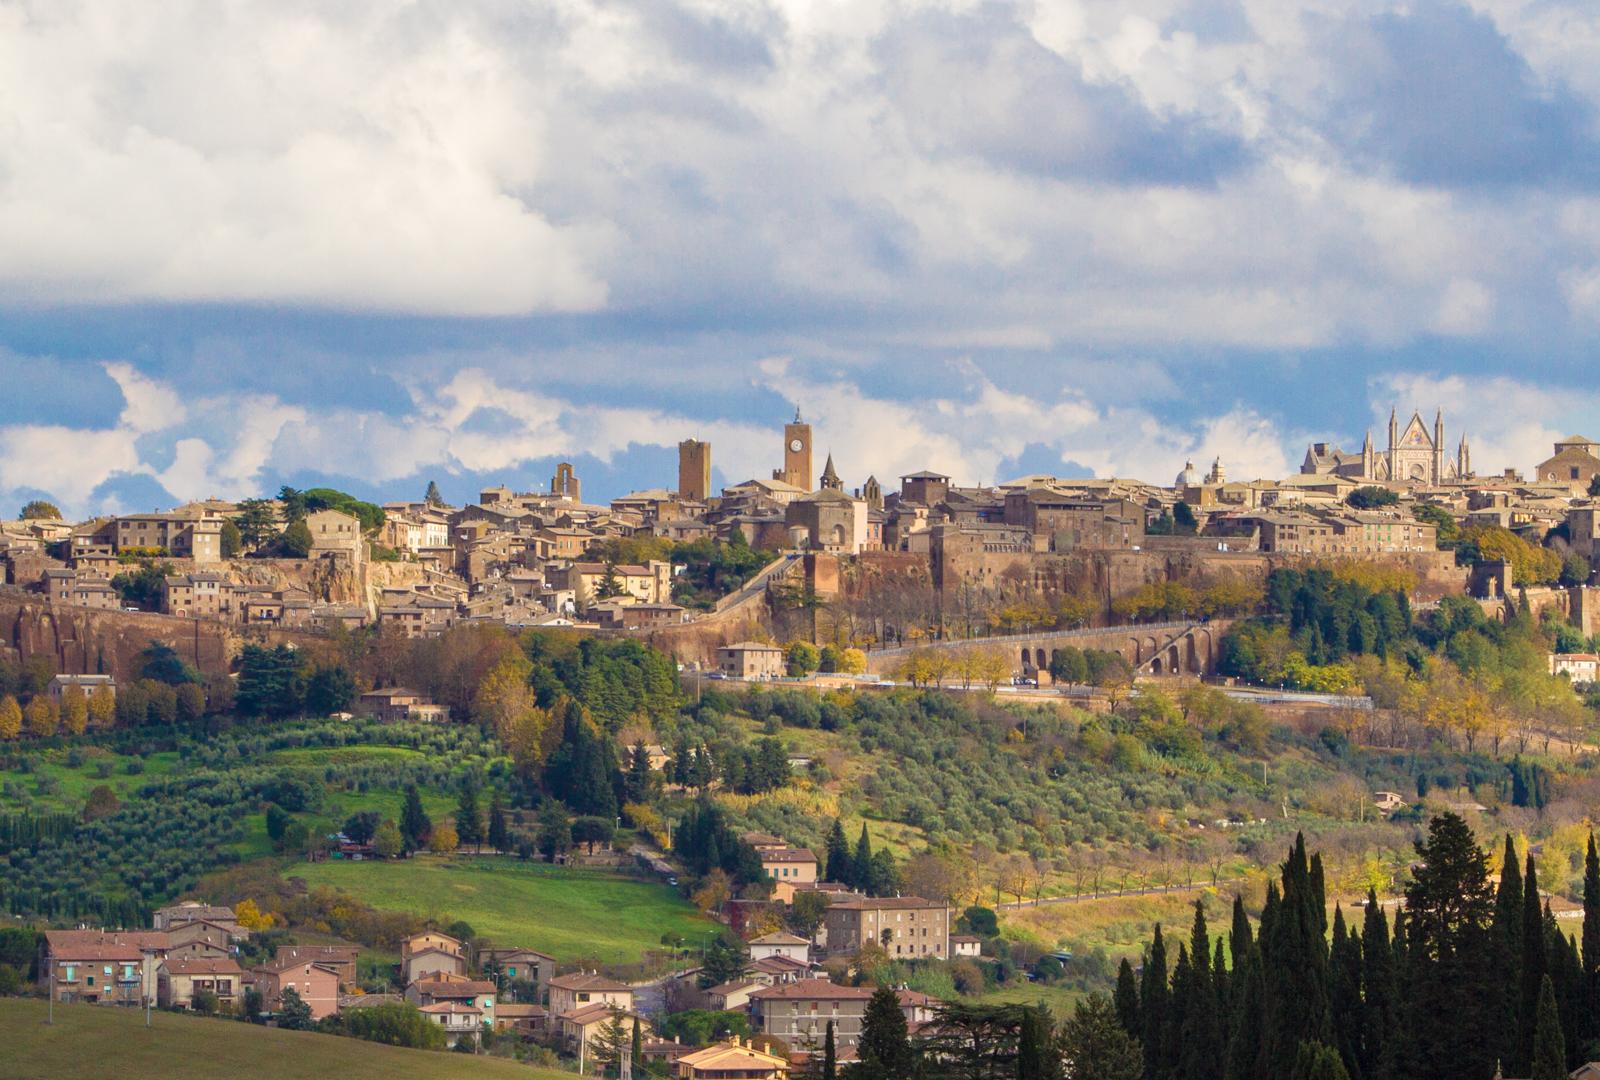 Rustic Cooking Explore The Region Villa Segreto Gelsomino